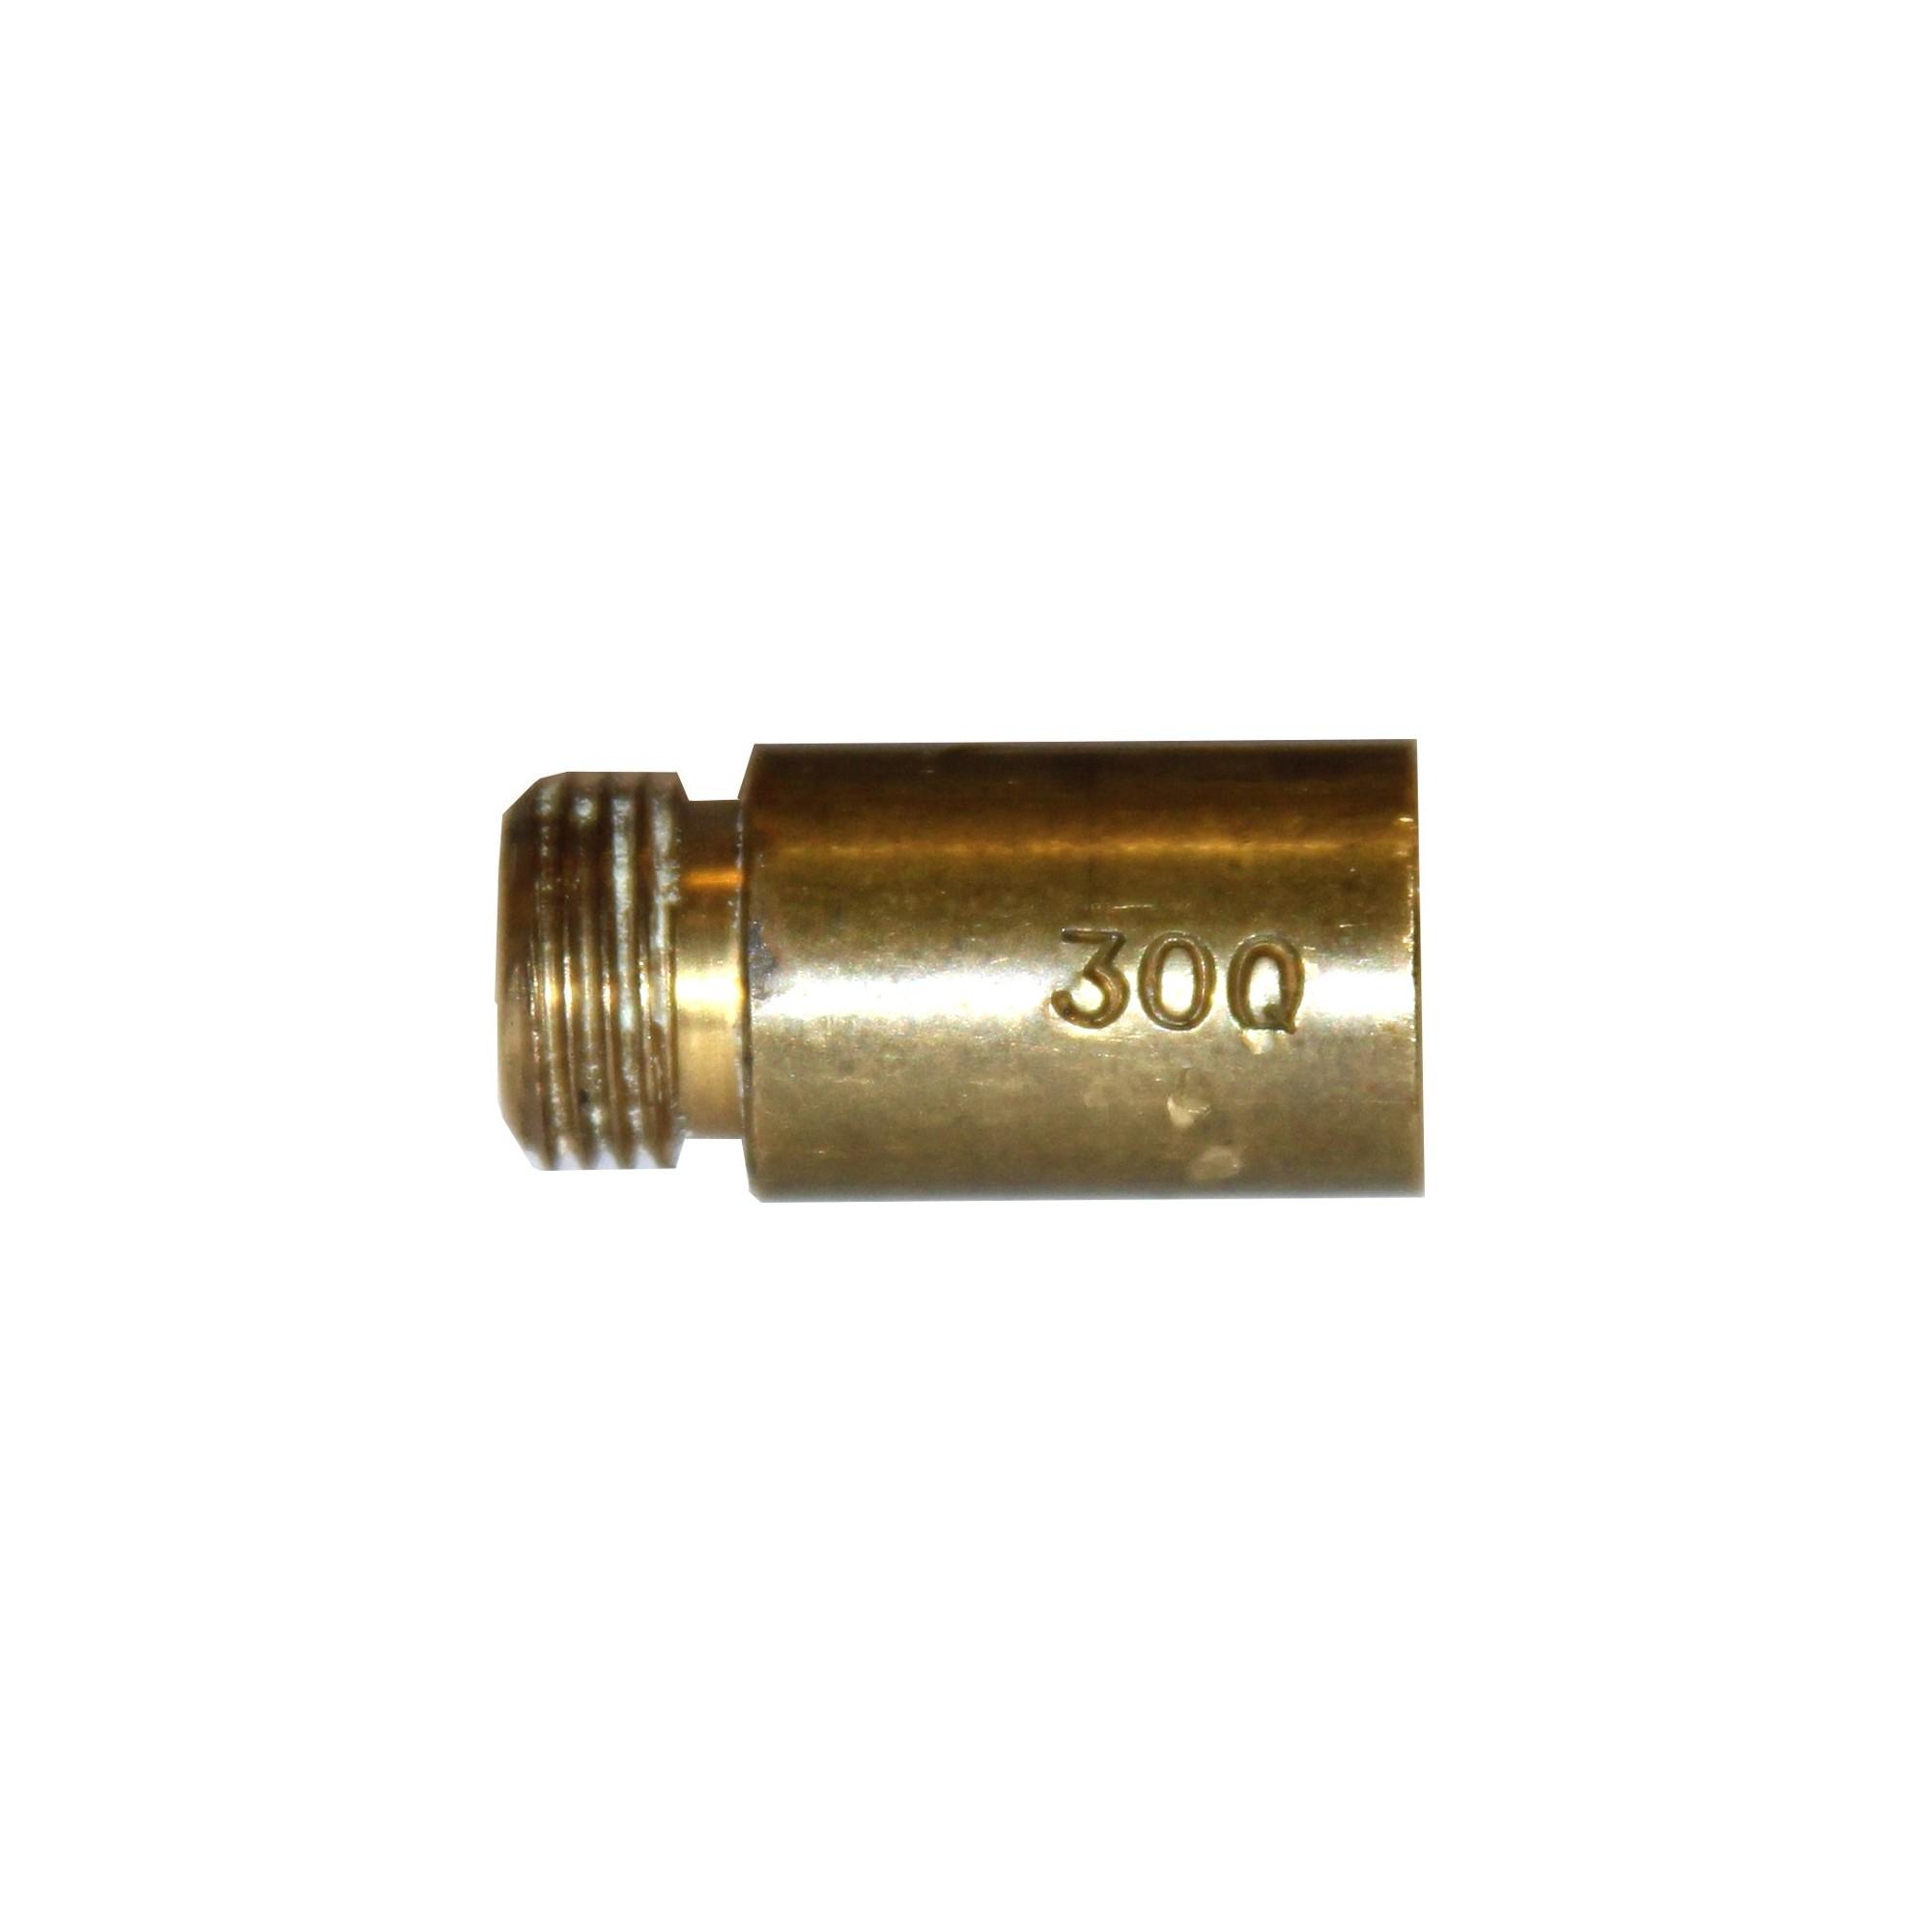 INJECTEUR PRINCIPAL GAZ NATURELLE: 300 × 16VB